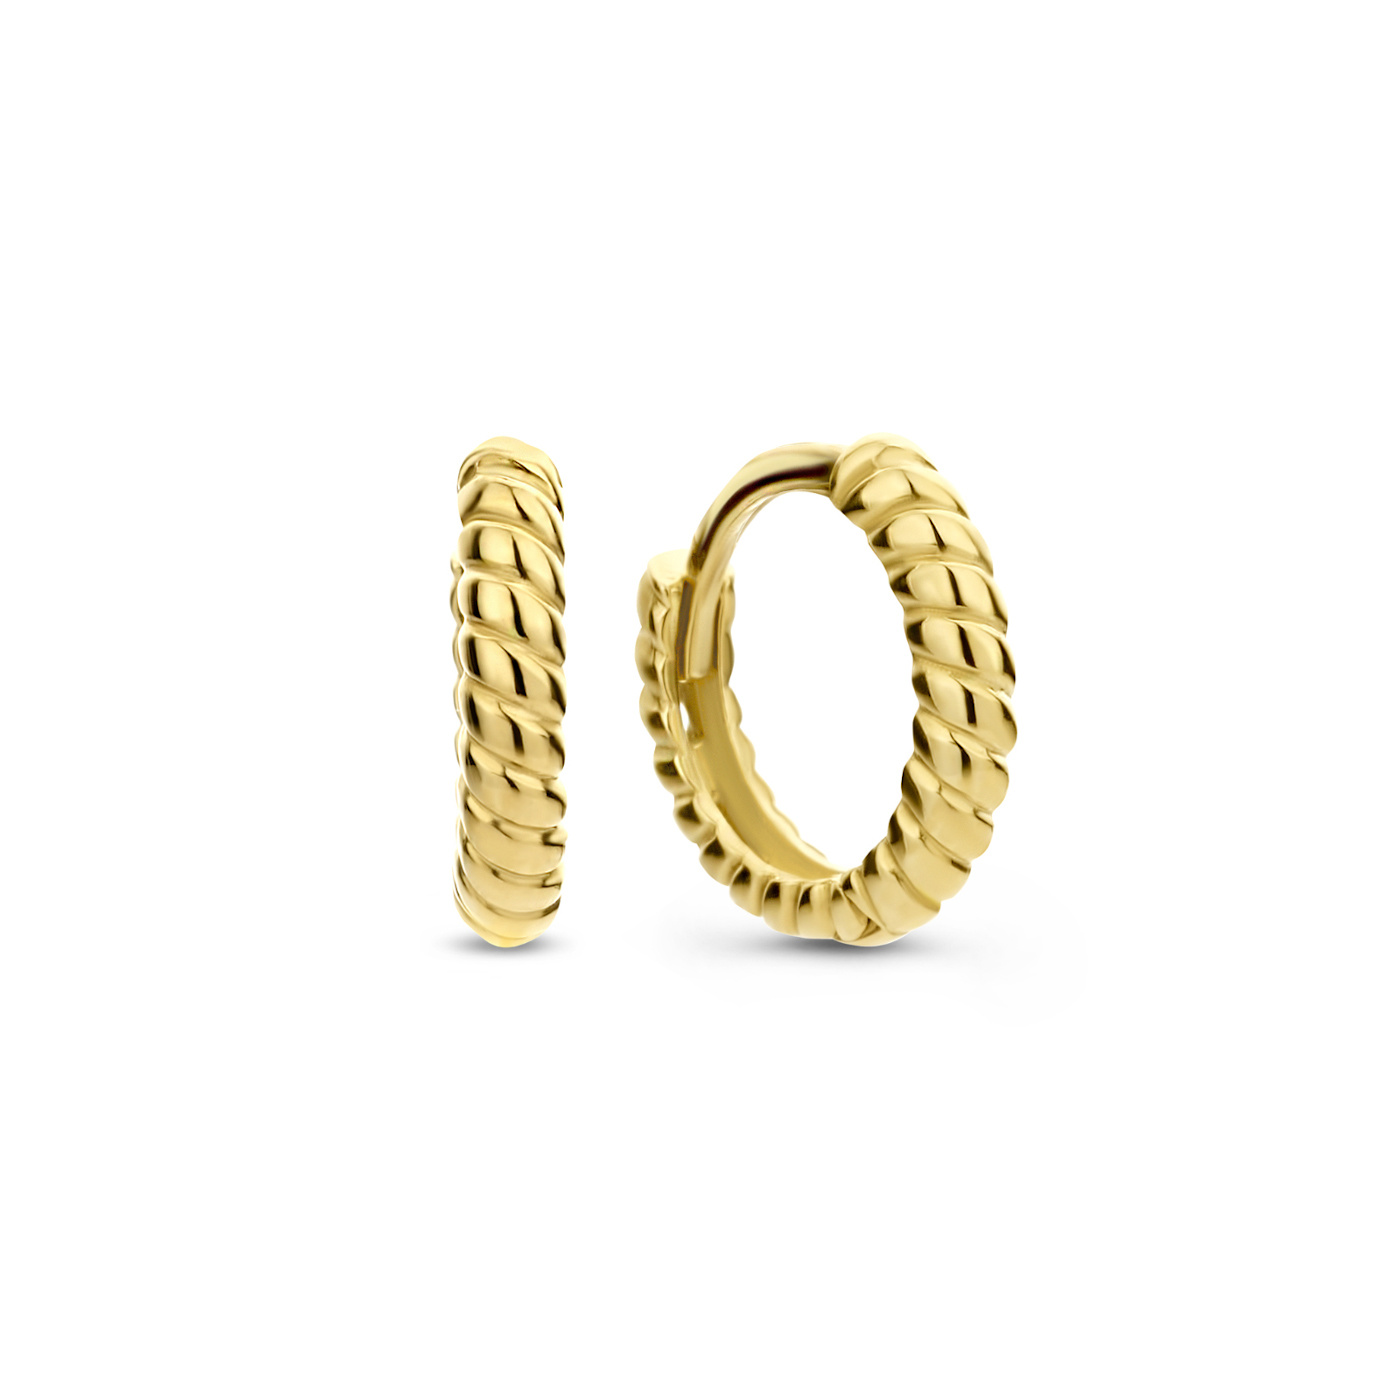 Isabel Bernard Le Marais Anne-Colette 14 karaat gouden oorbellen twist